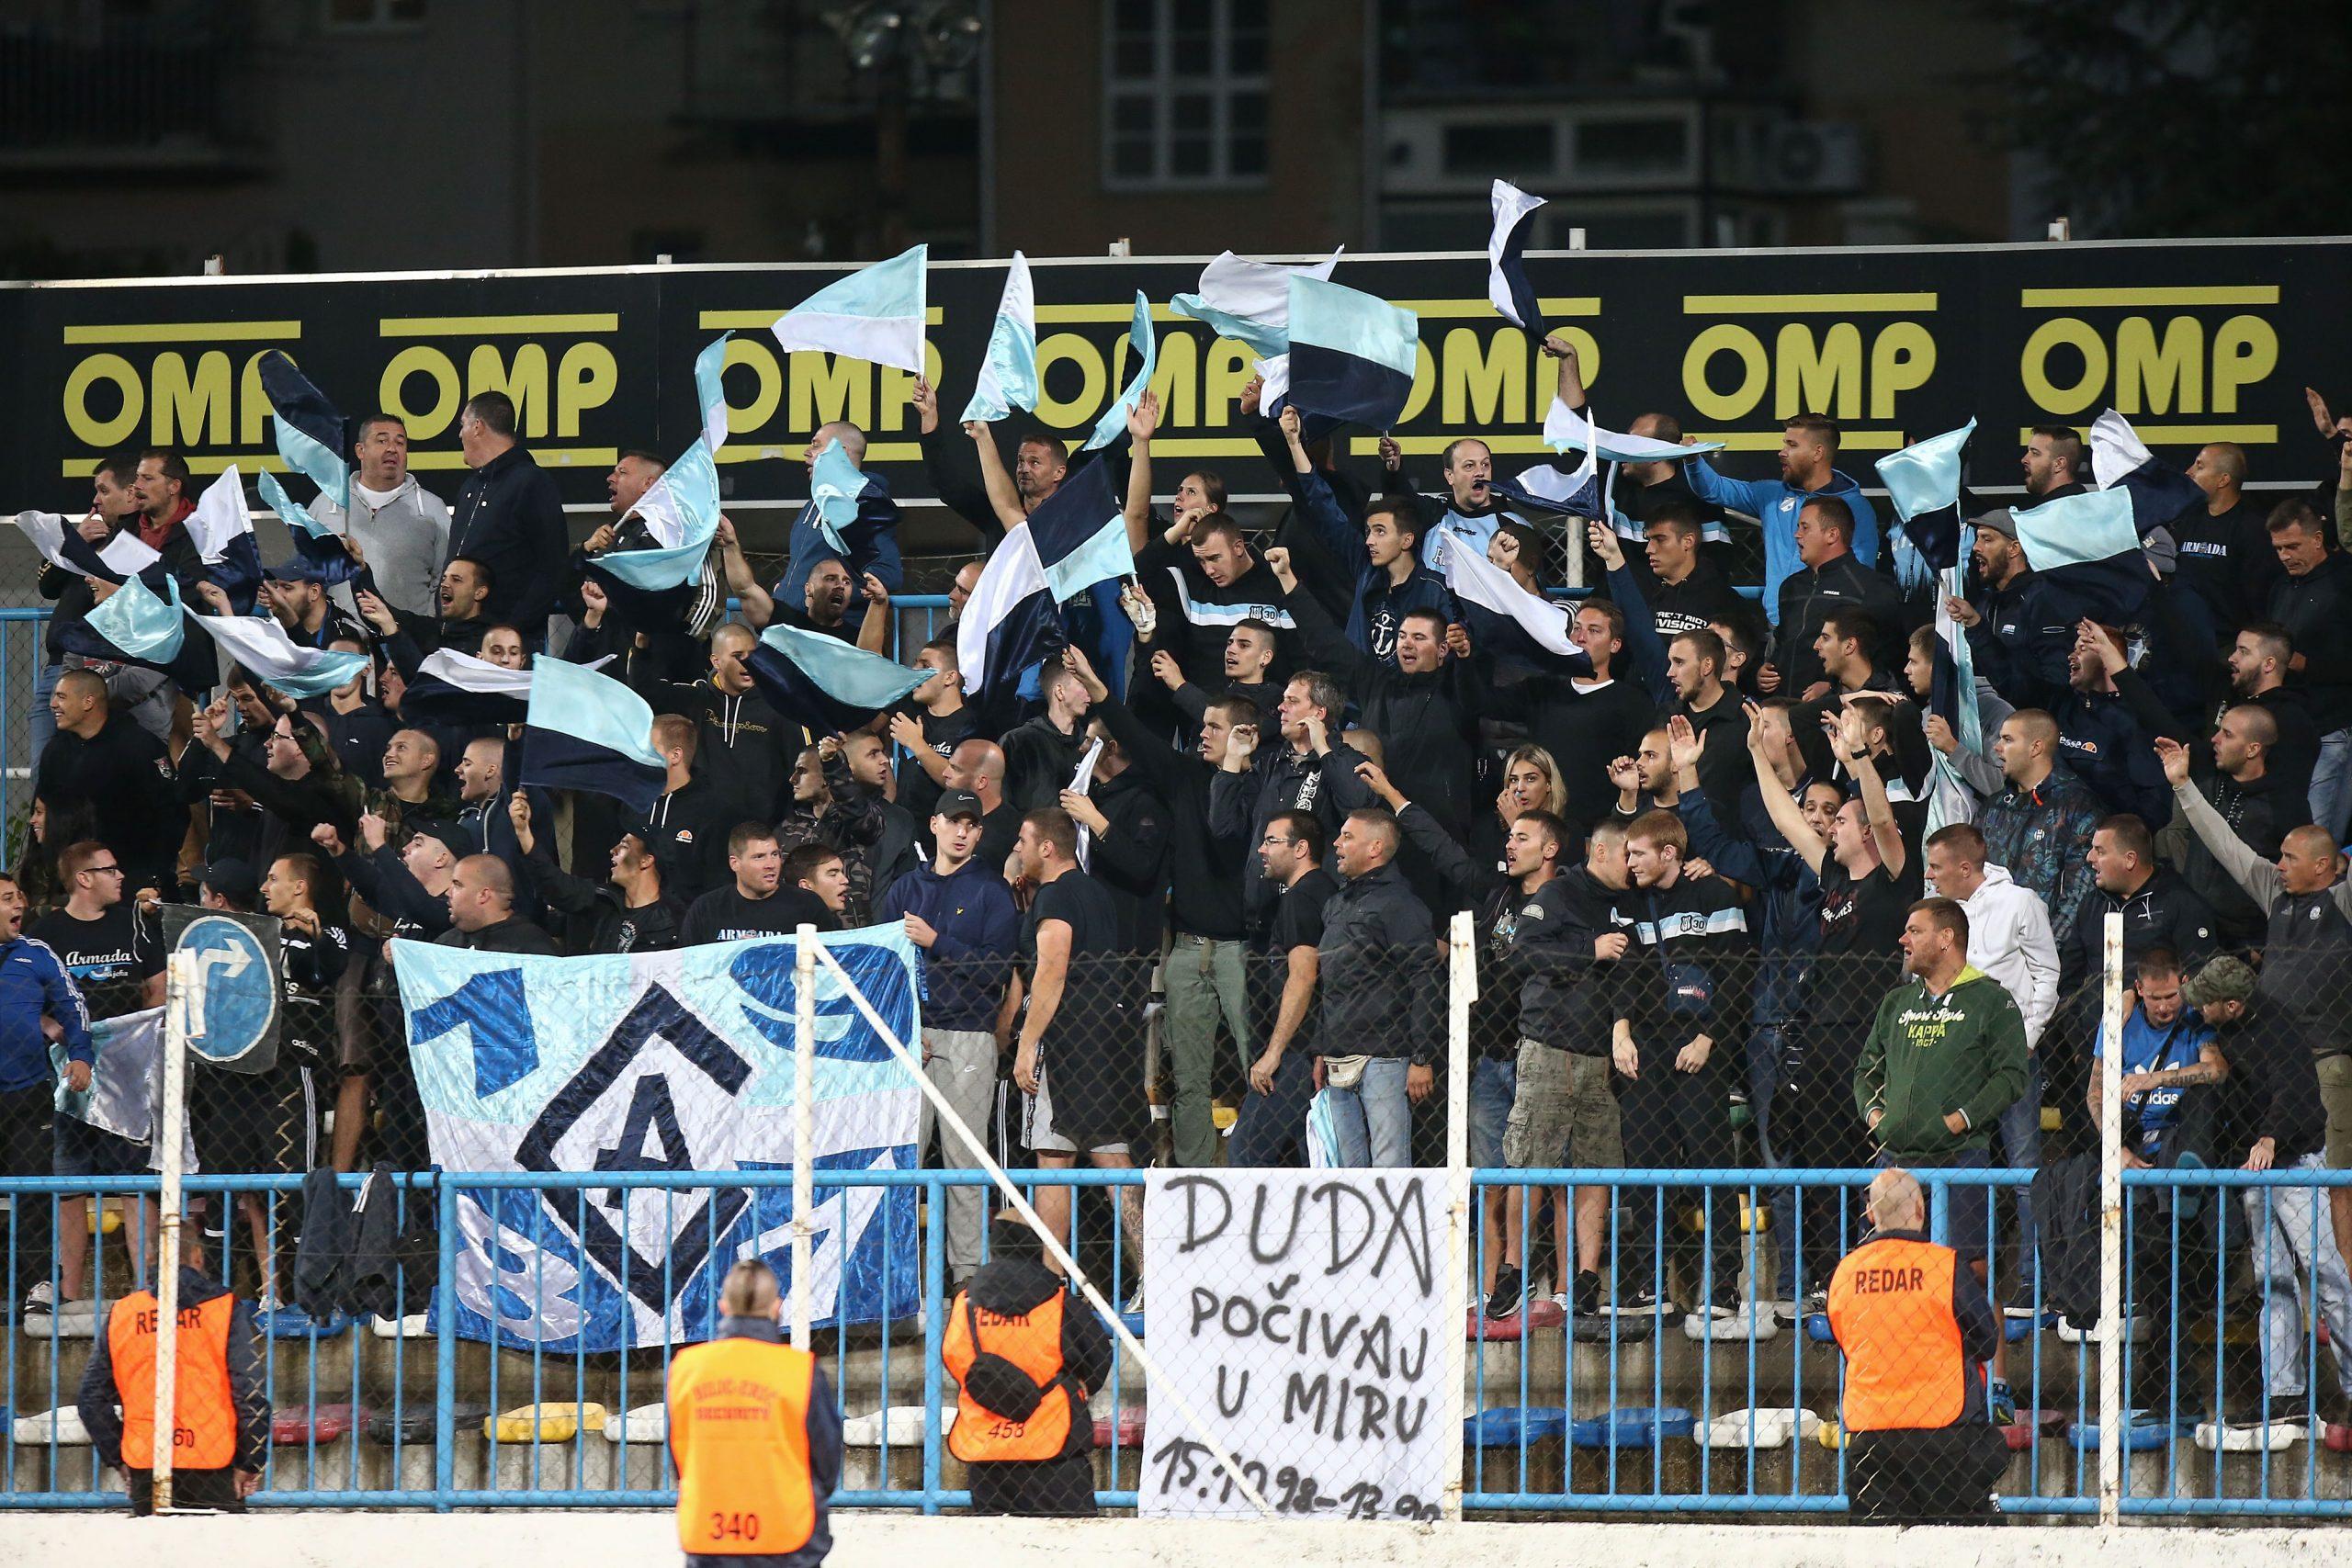 Armada u Kranjčevićevoj/Foto PIXSELL